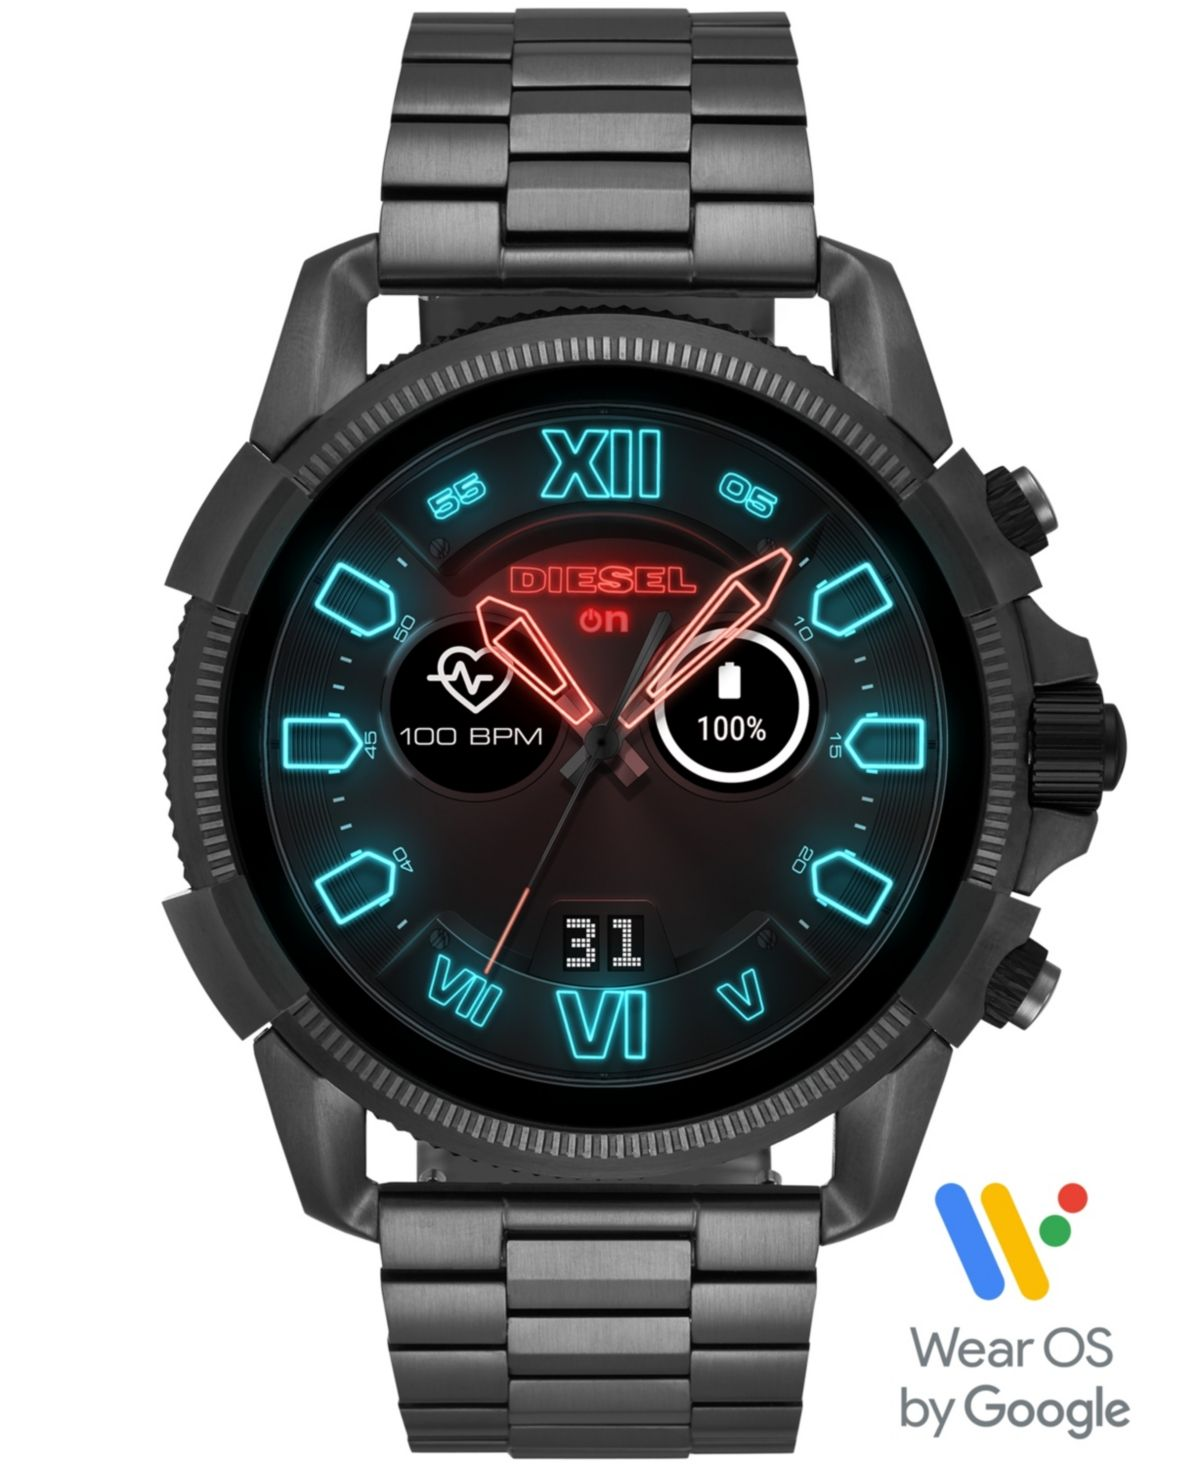 Diesel Men S Full Guard 2 5 Gunmetal Stainless Steel Bracelet Touchscreen Smart Watch 48mm Powered By Wear Os By Google Reviews Watches Jewelry Watches Macy S Diesel Watch